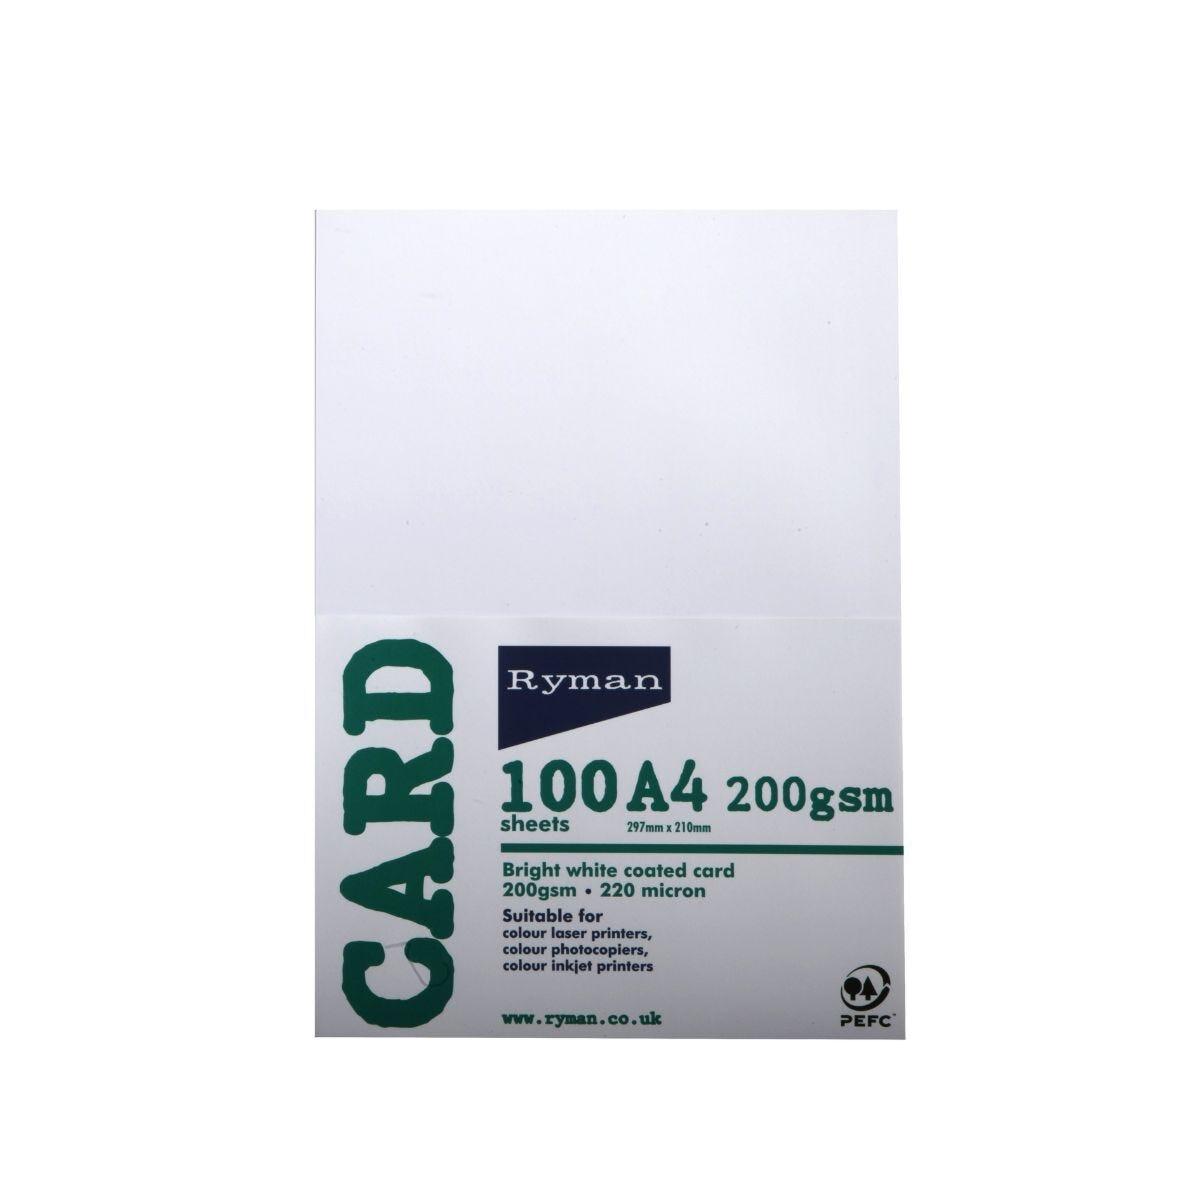 Ryman Card A4 200gsm 100 Sheets White